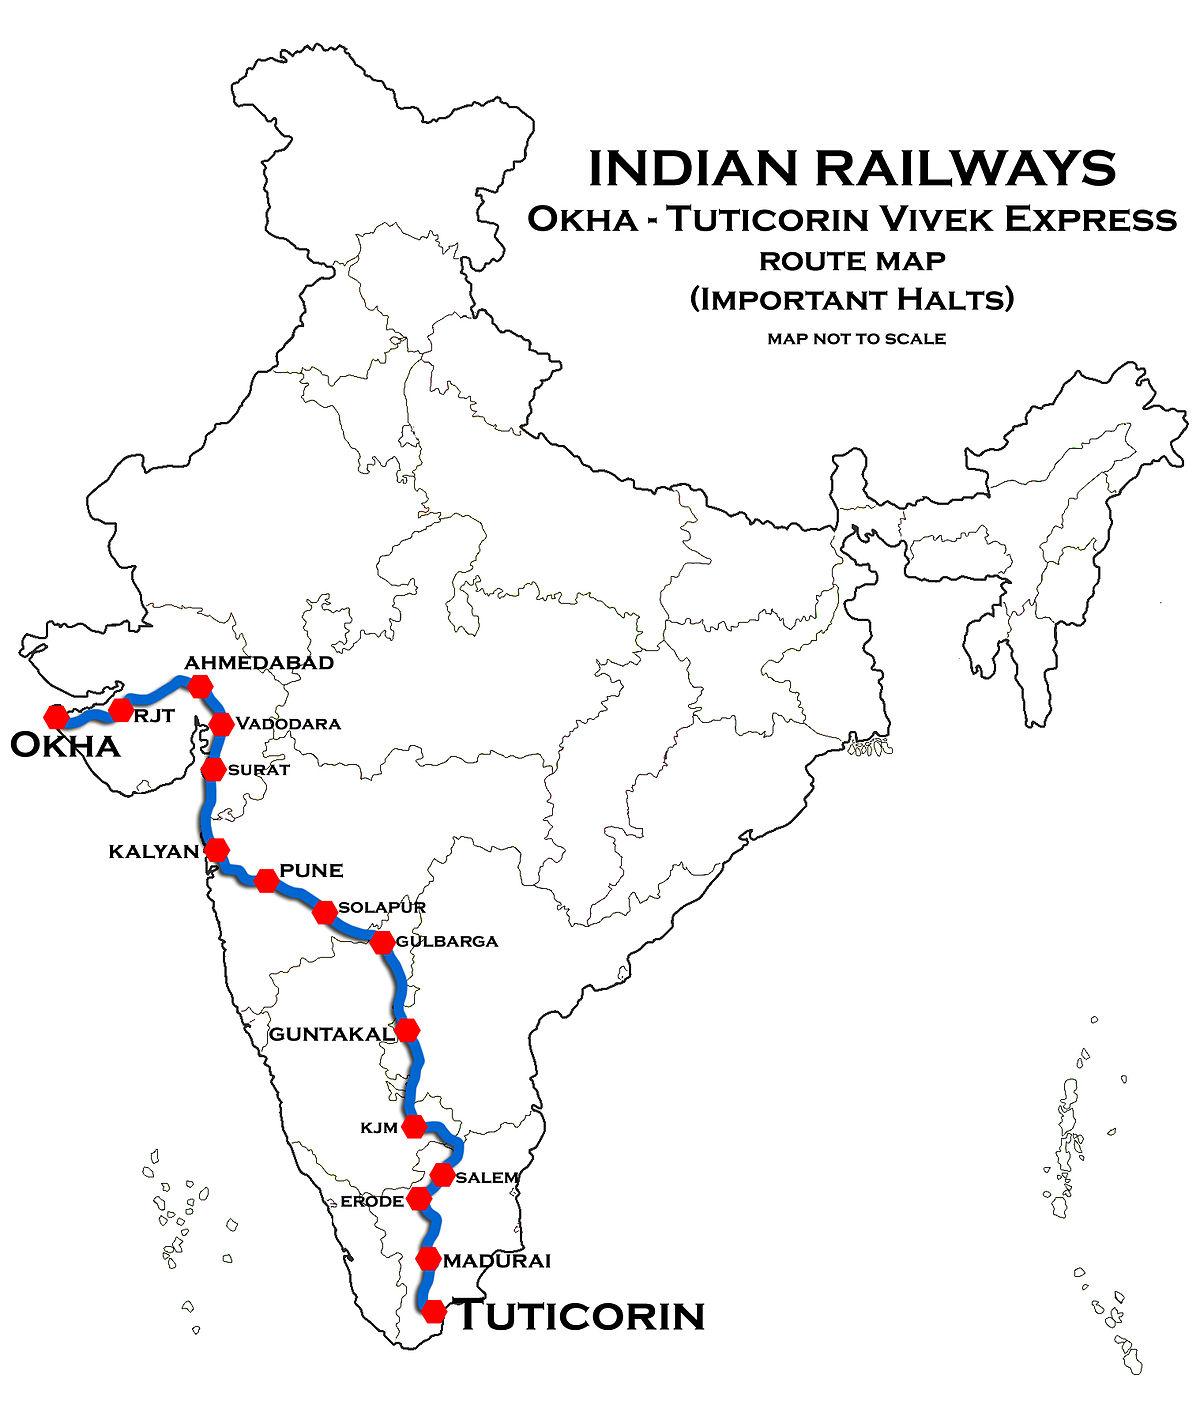 Okha - Tuticorin Vivek Express - Wikipedia